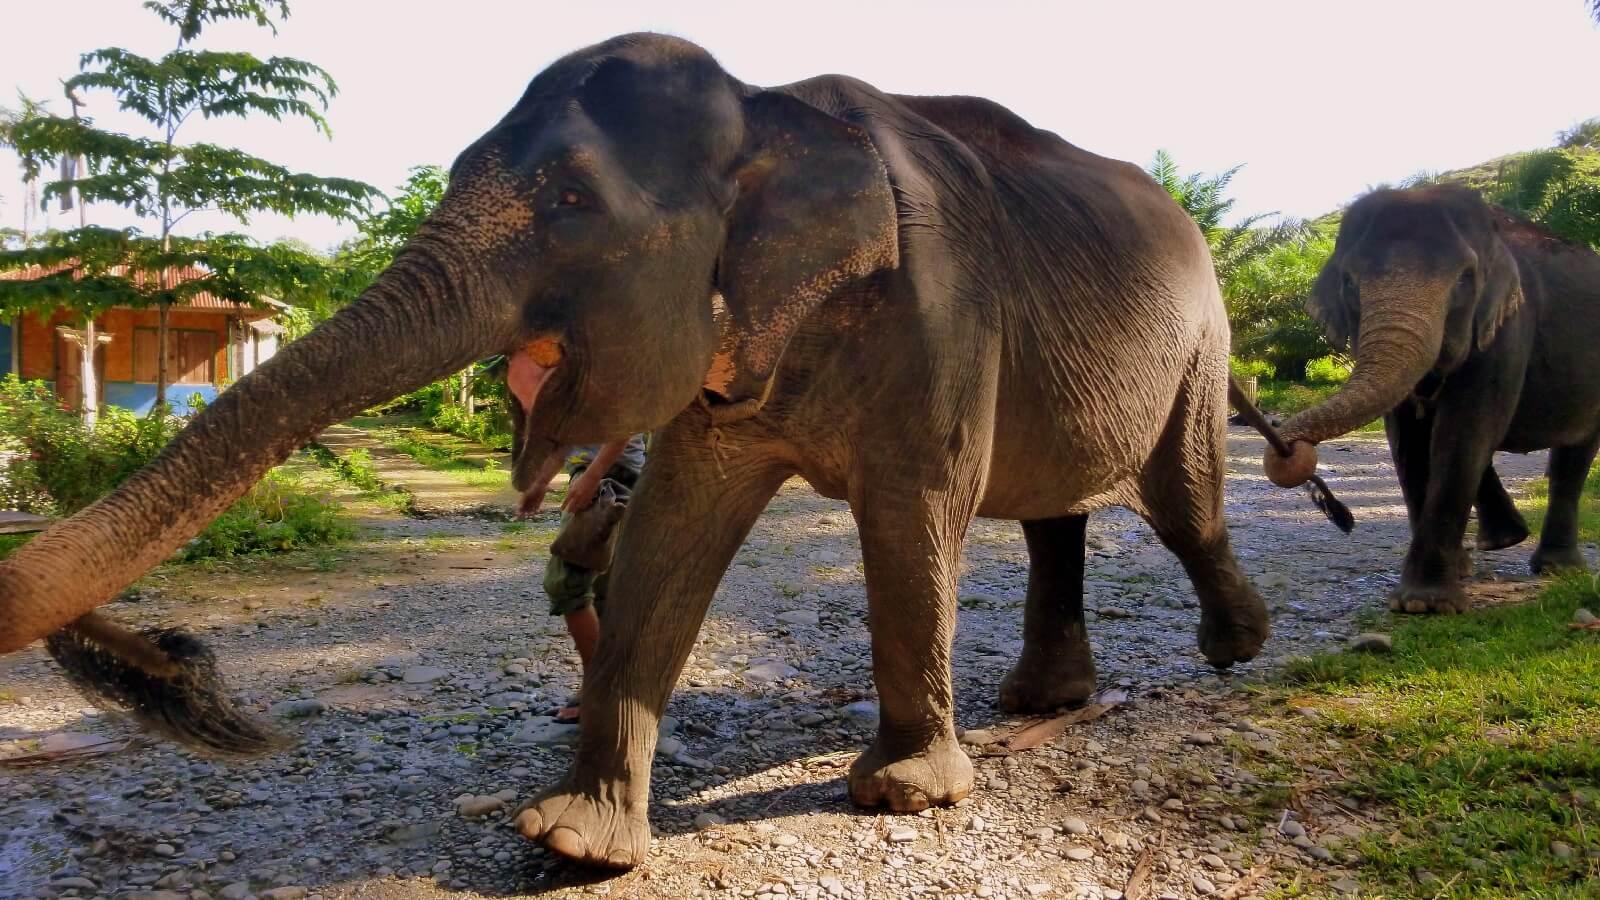 Une idée de circuit dans la jungle de Sumatra